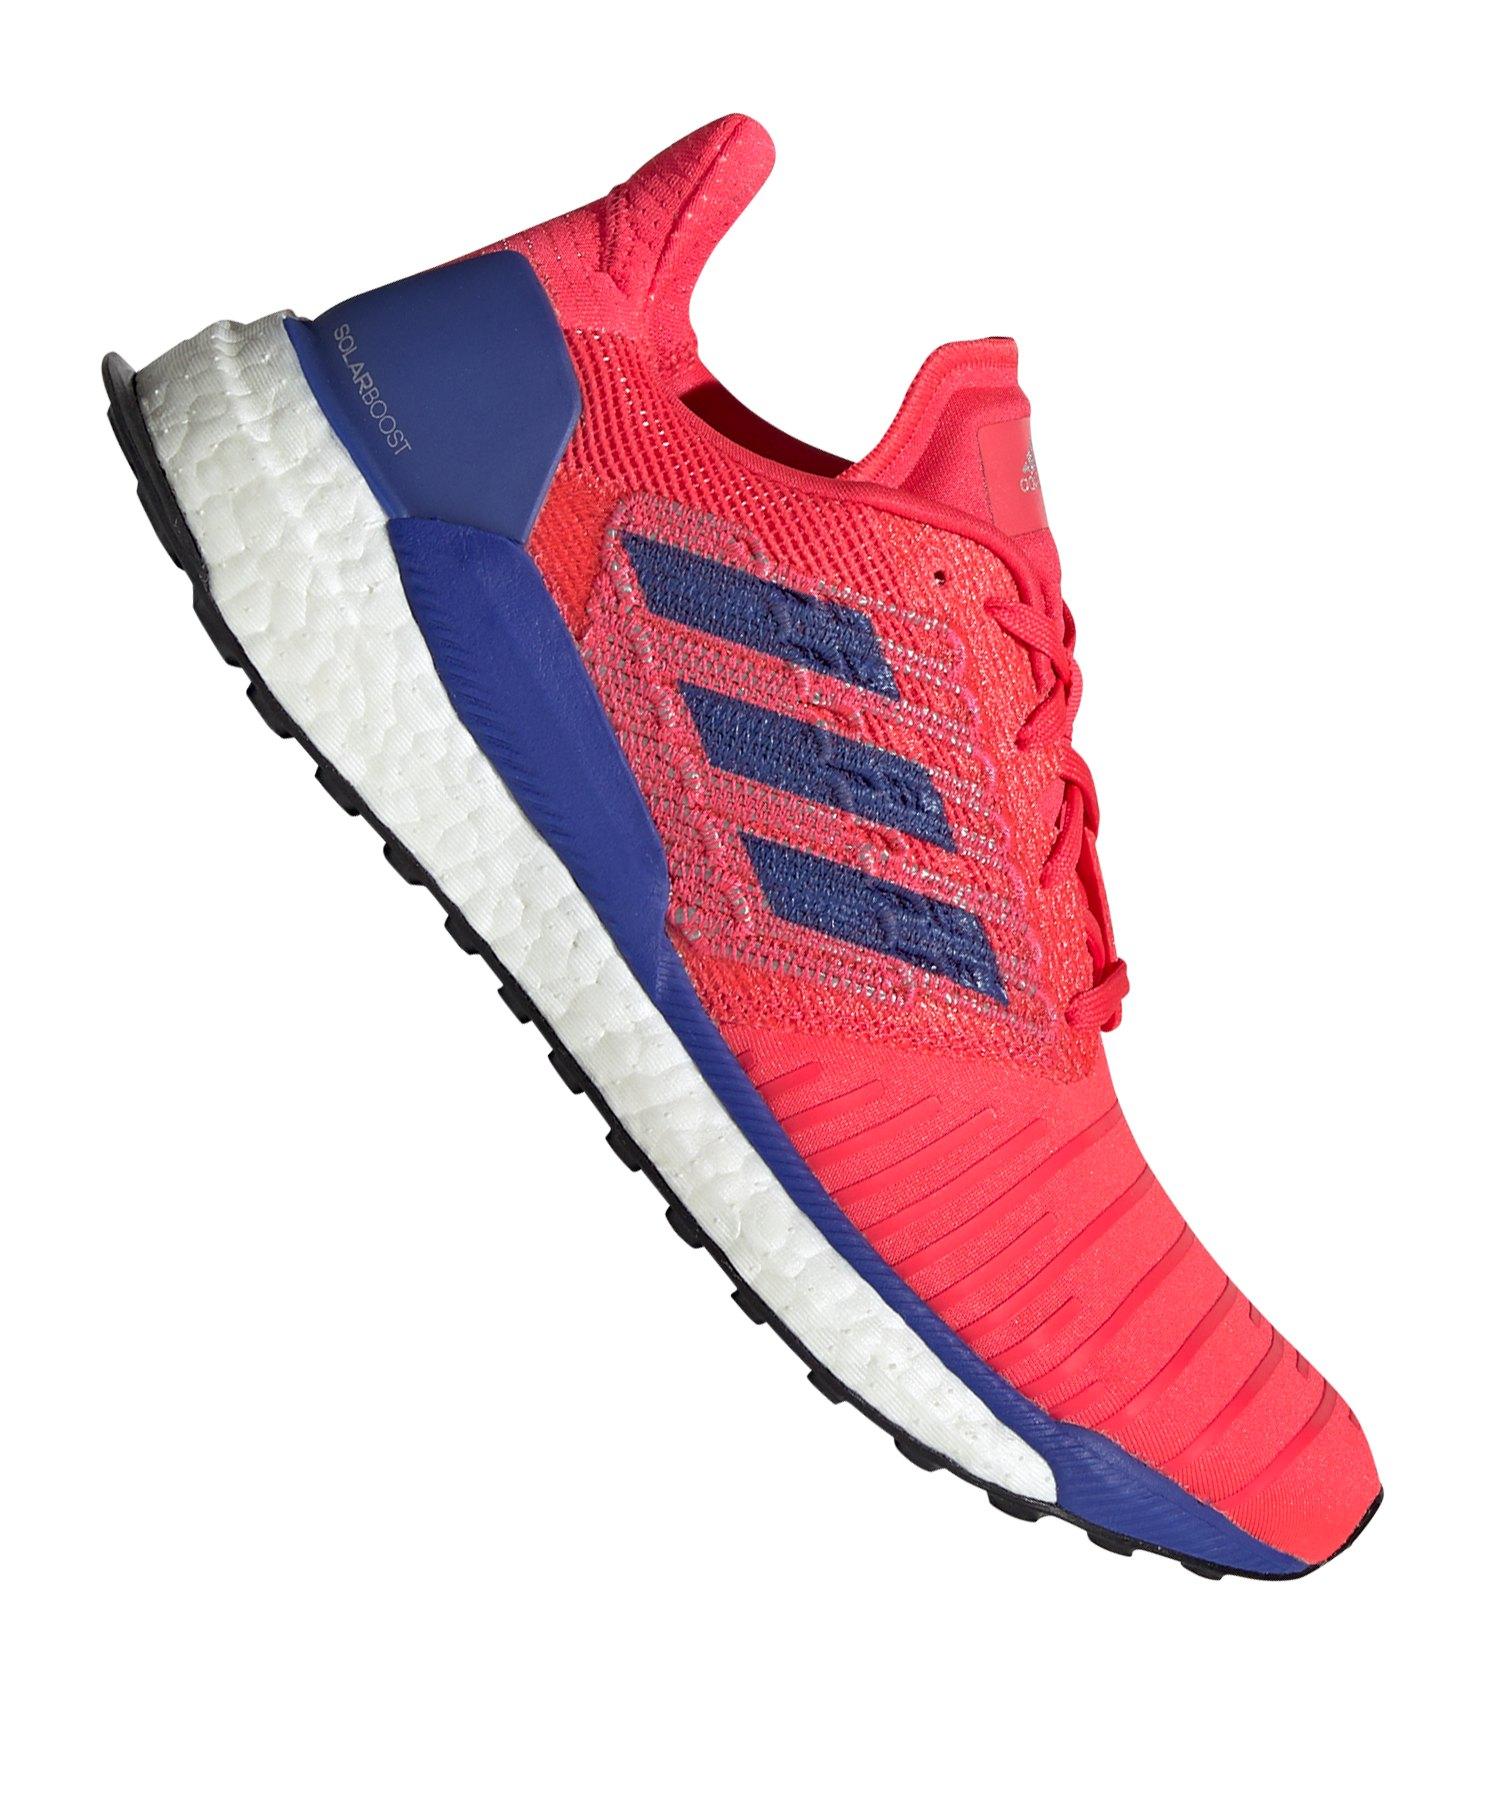 adidas Solar Boost Running Damen Rot Blau